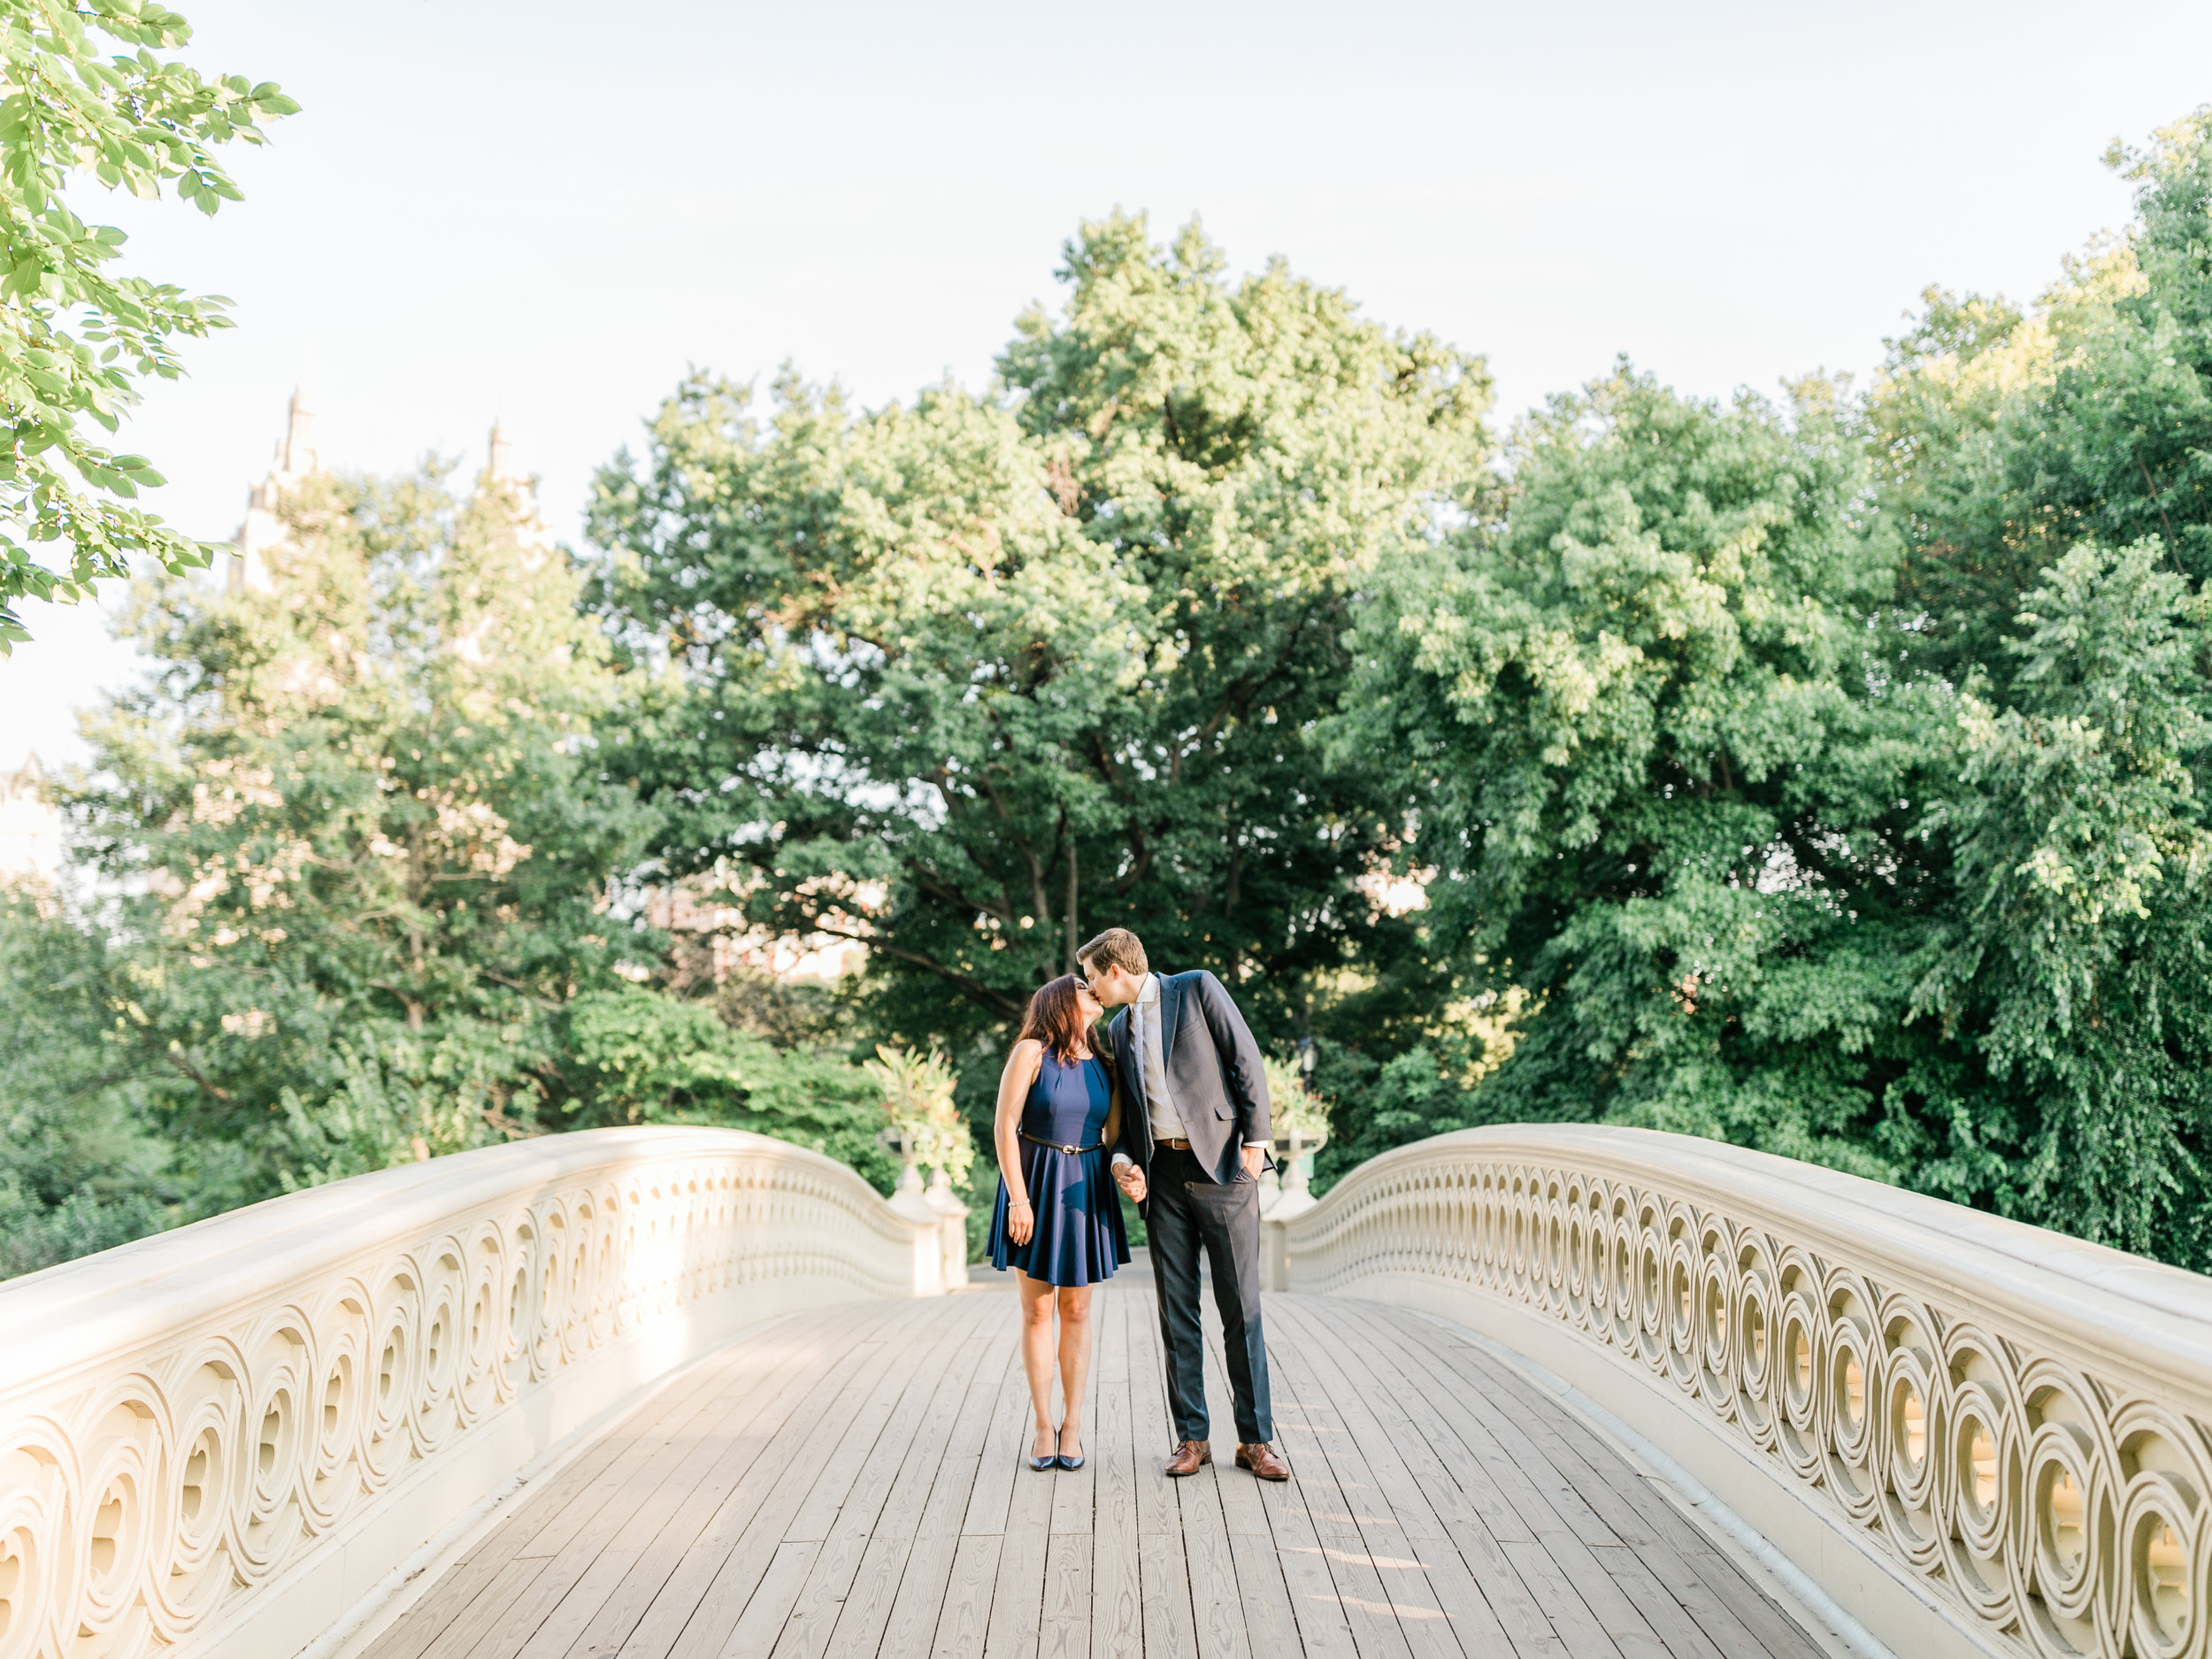 central-park-engagement-photography-asher-gardner25.jpg